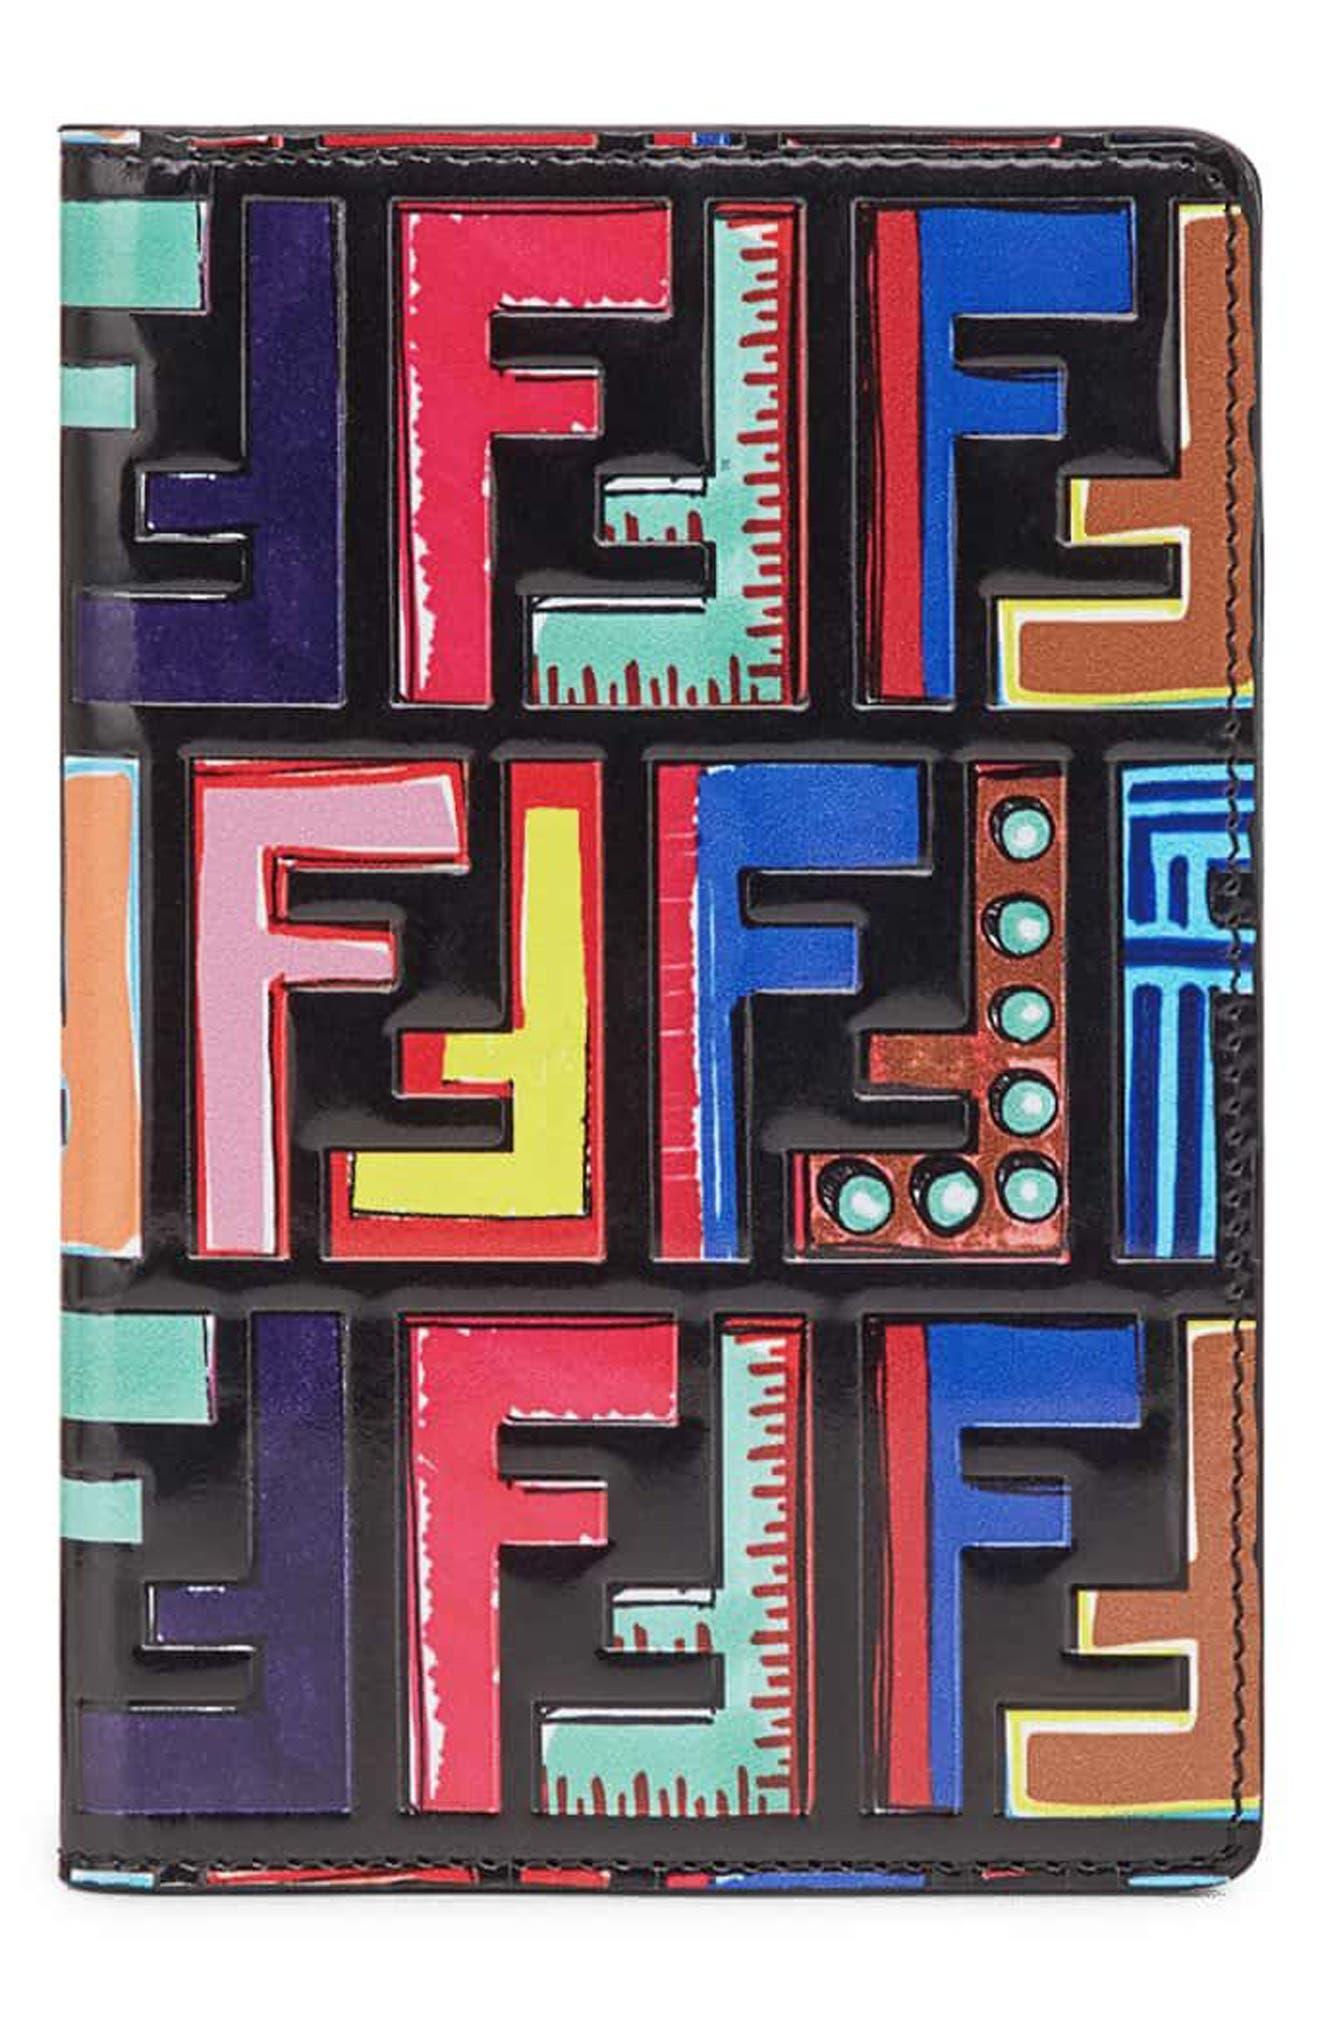 Fendi Logo Wallet Price